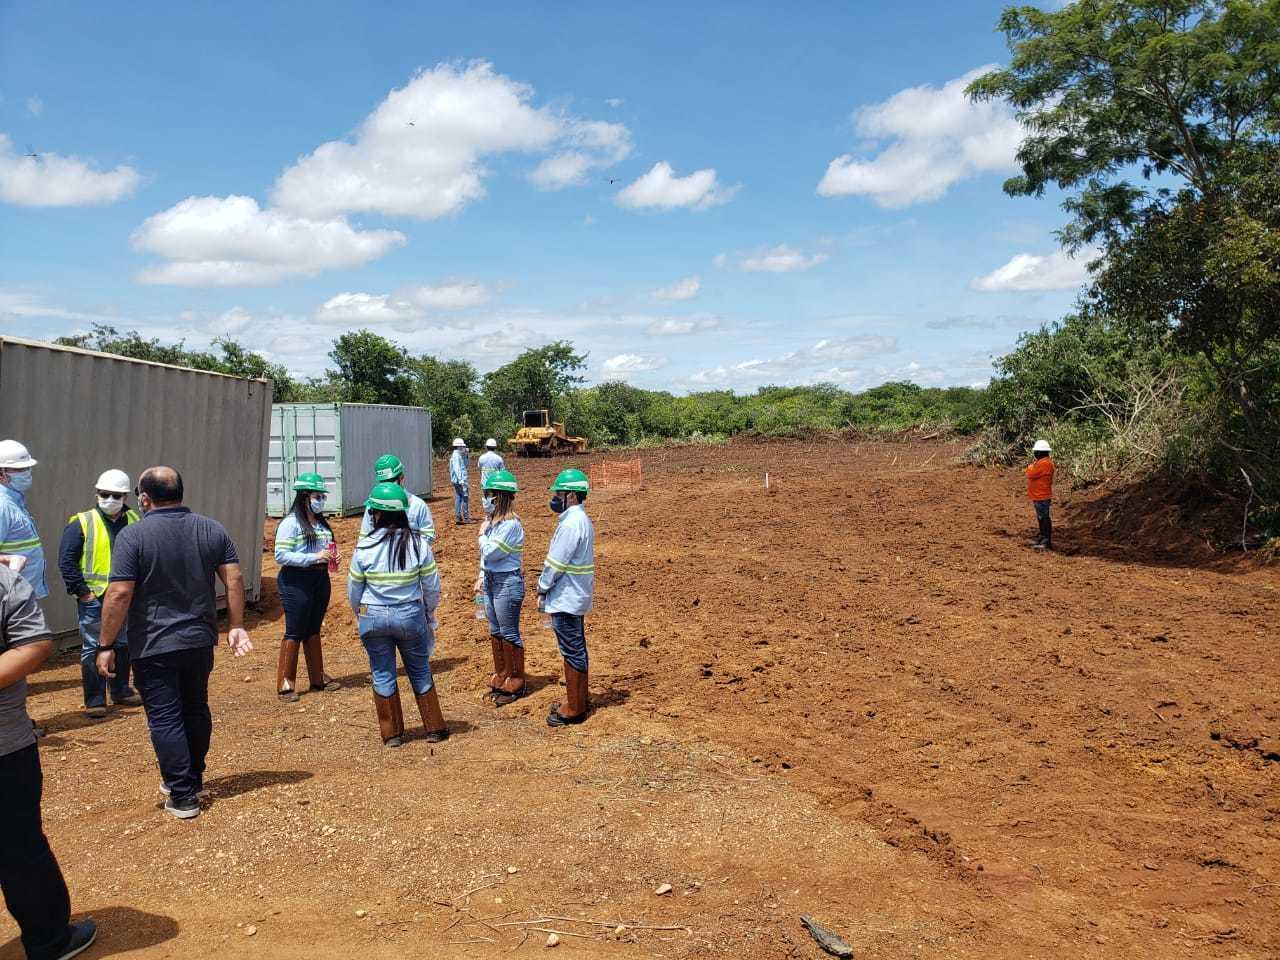 IMAGEM: Exclusivo: empresa investigada na Black Flag construiu parque de energia solar no Ceará